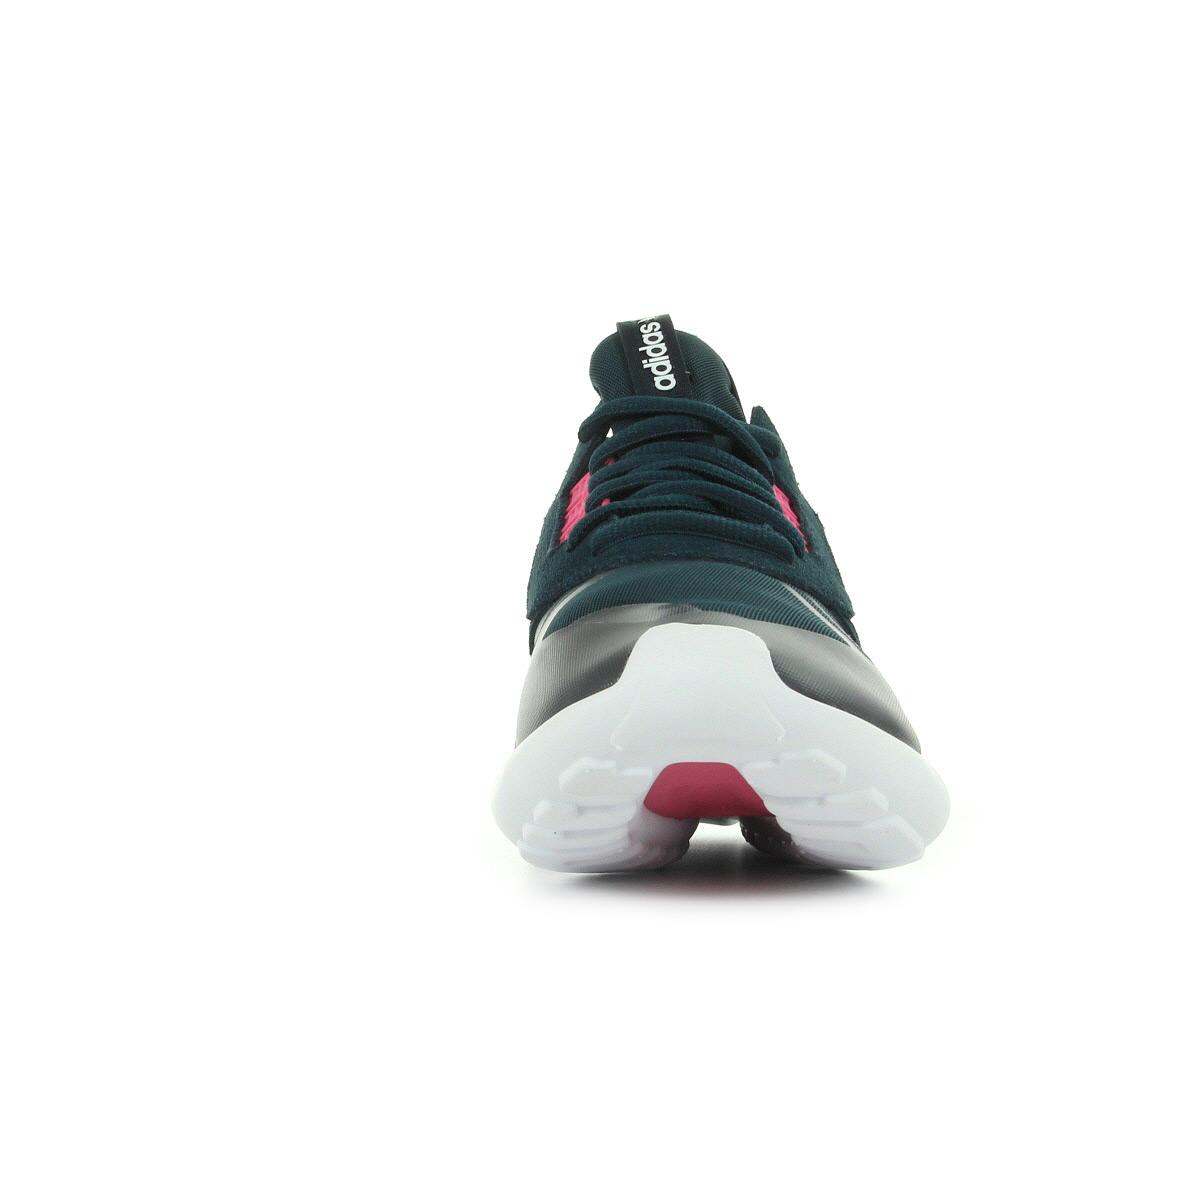 Runner Tubular Mode Adidas W B26300Baskets Femme tCQhdsrx